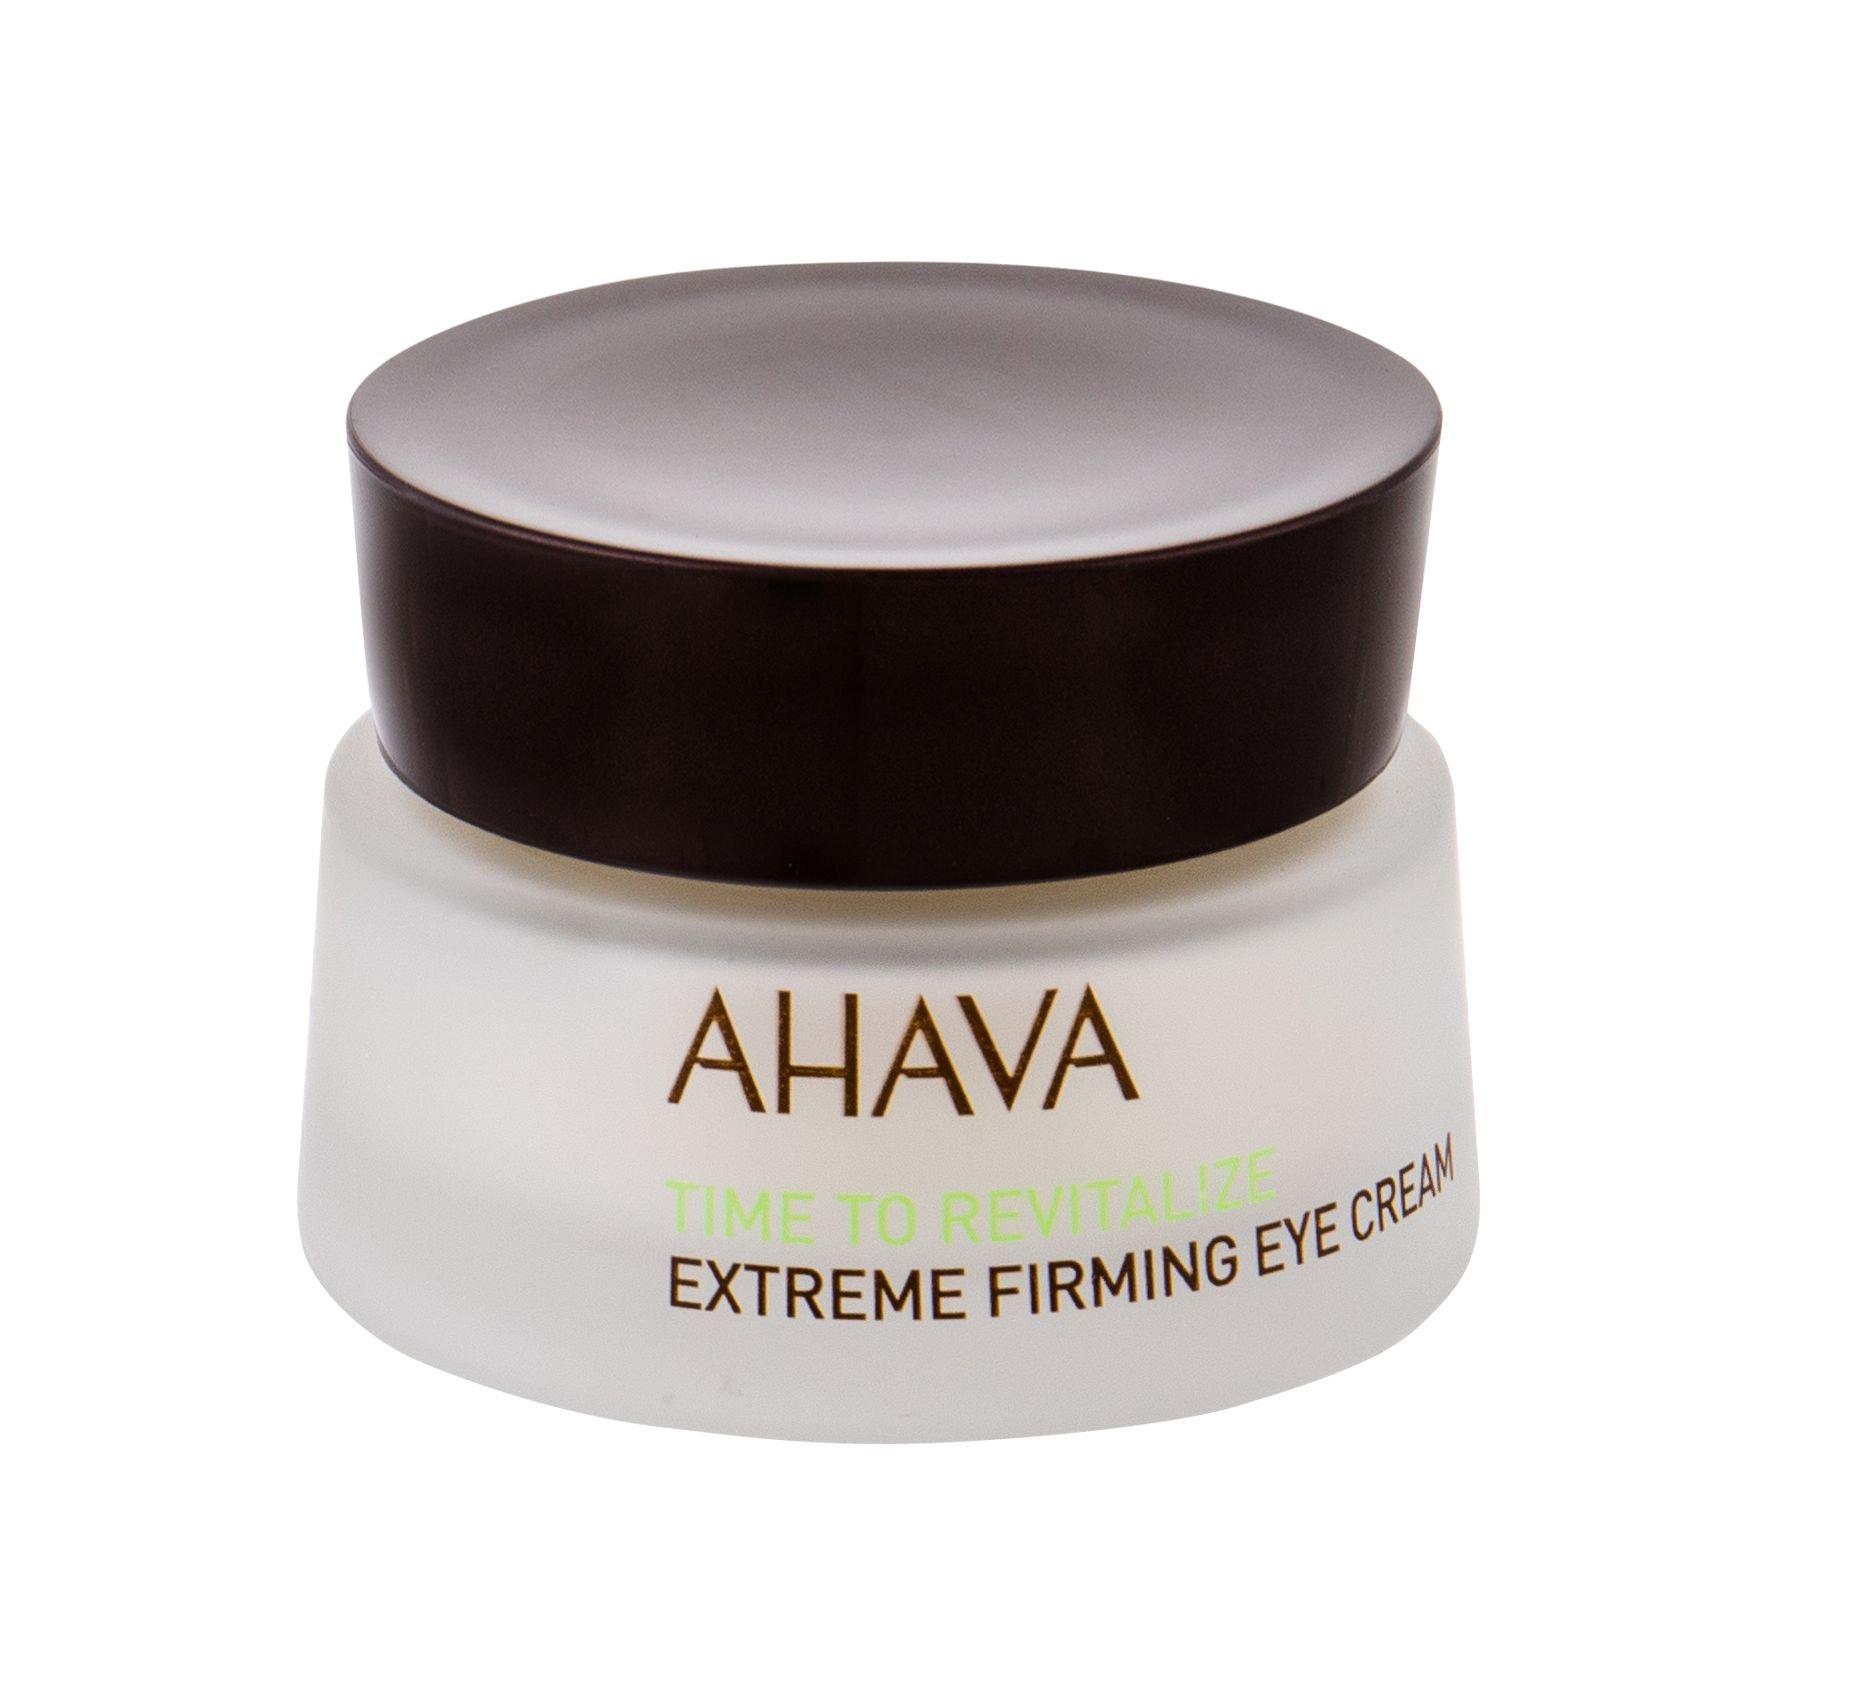 AHAVA Extreme Eye Cream 15ml  Time To Revitalize